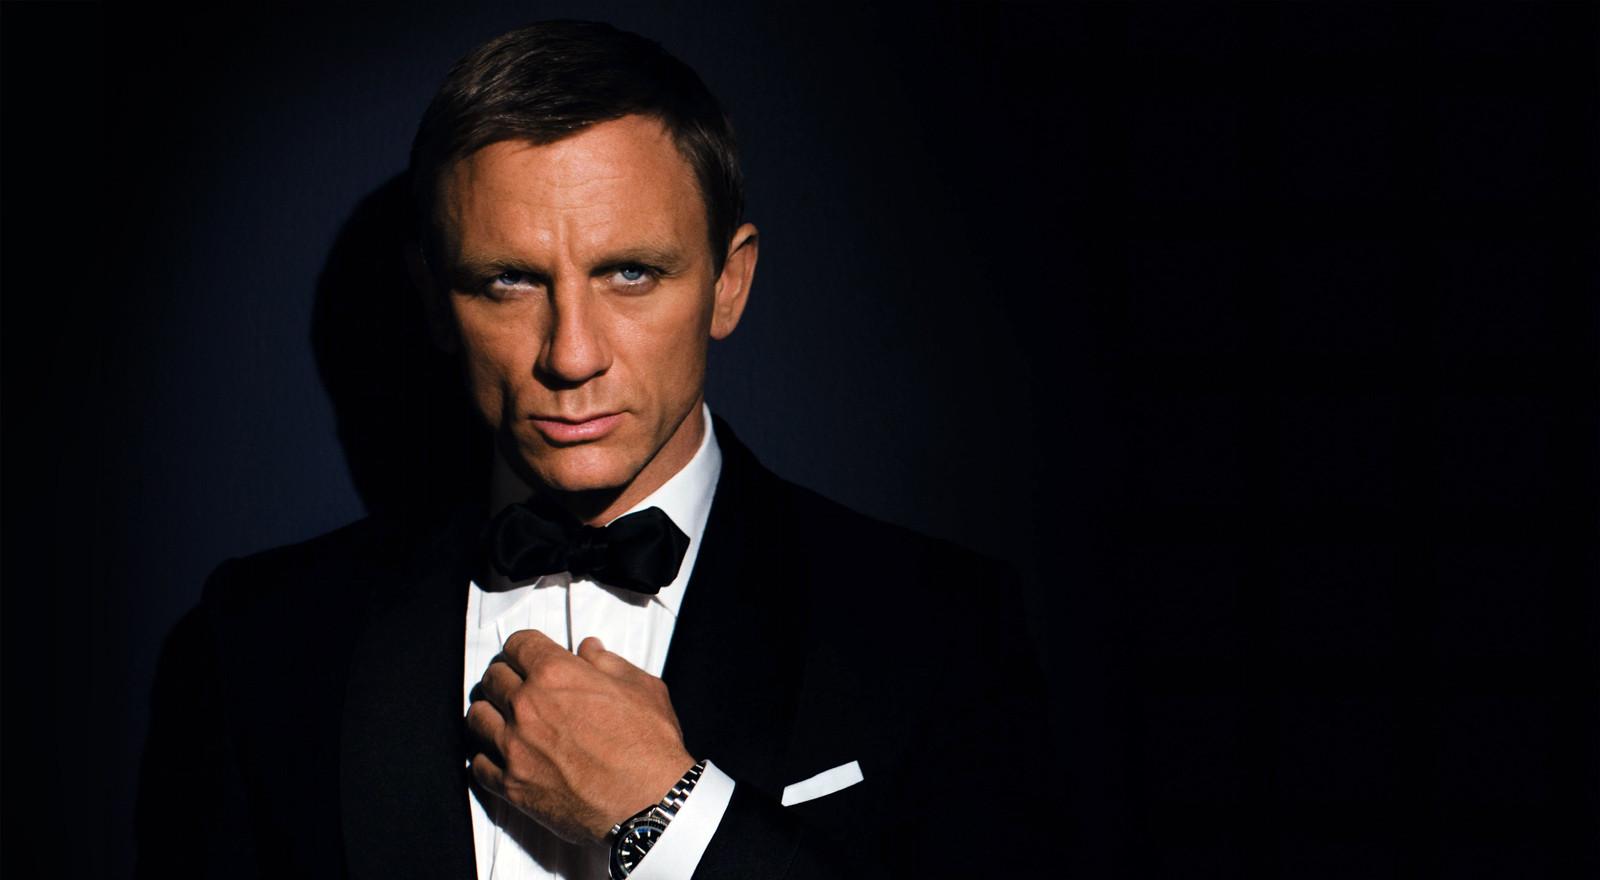 James_Bond_QOS_1600x1200.jpg